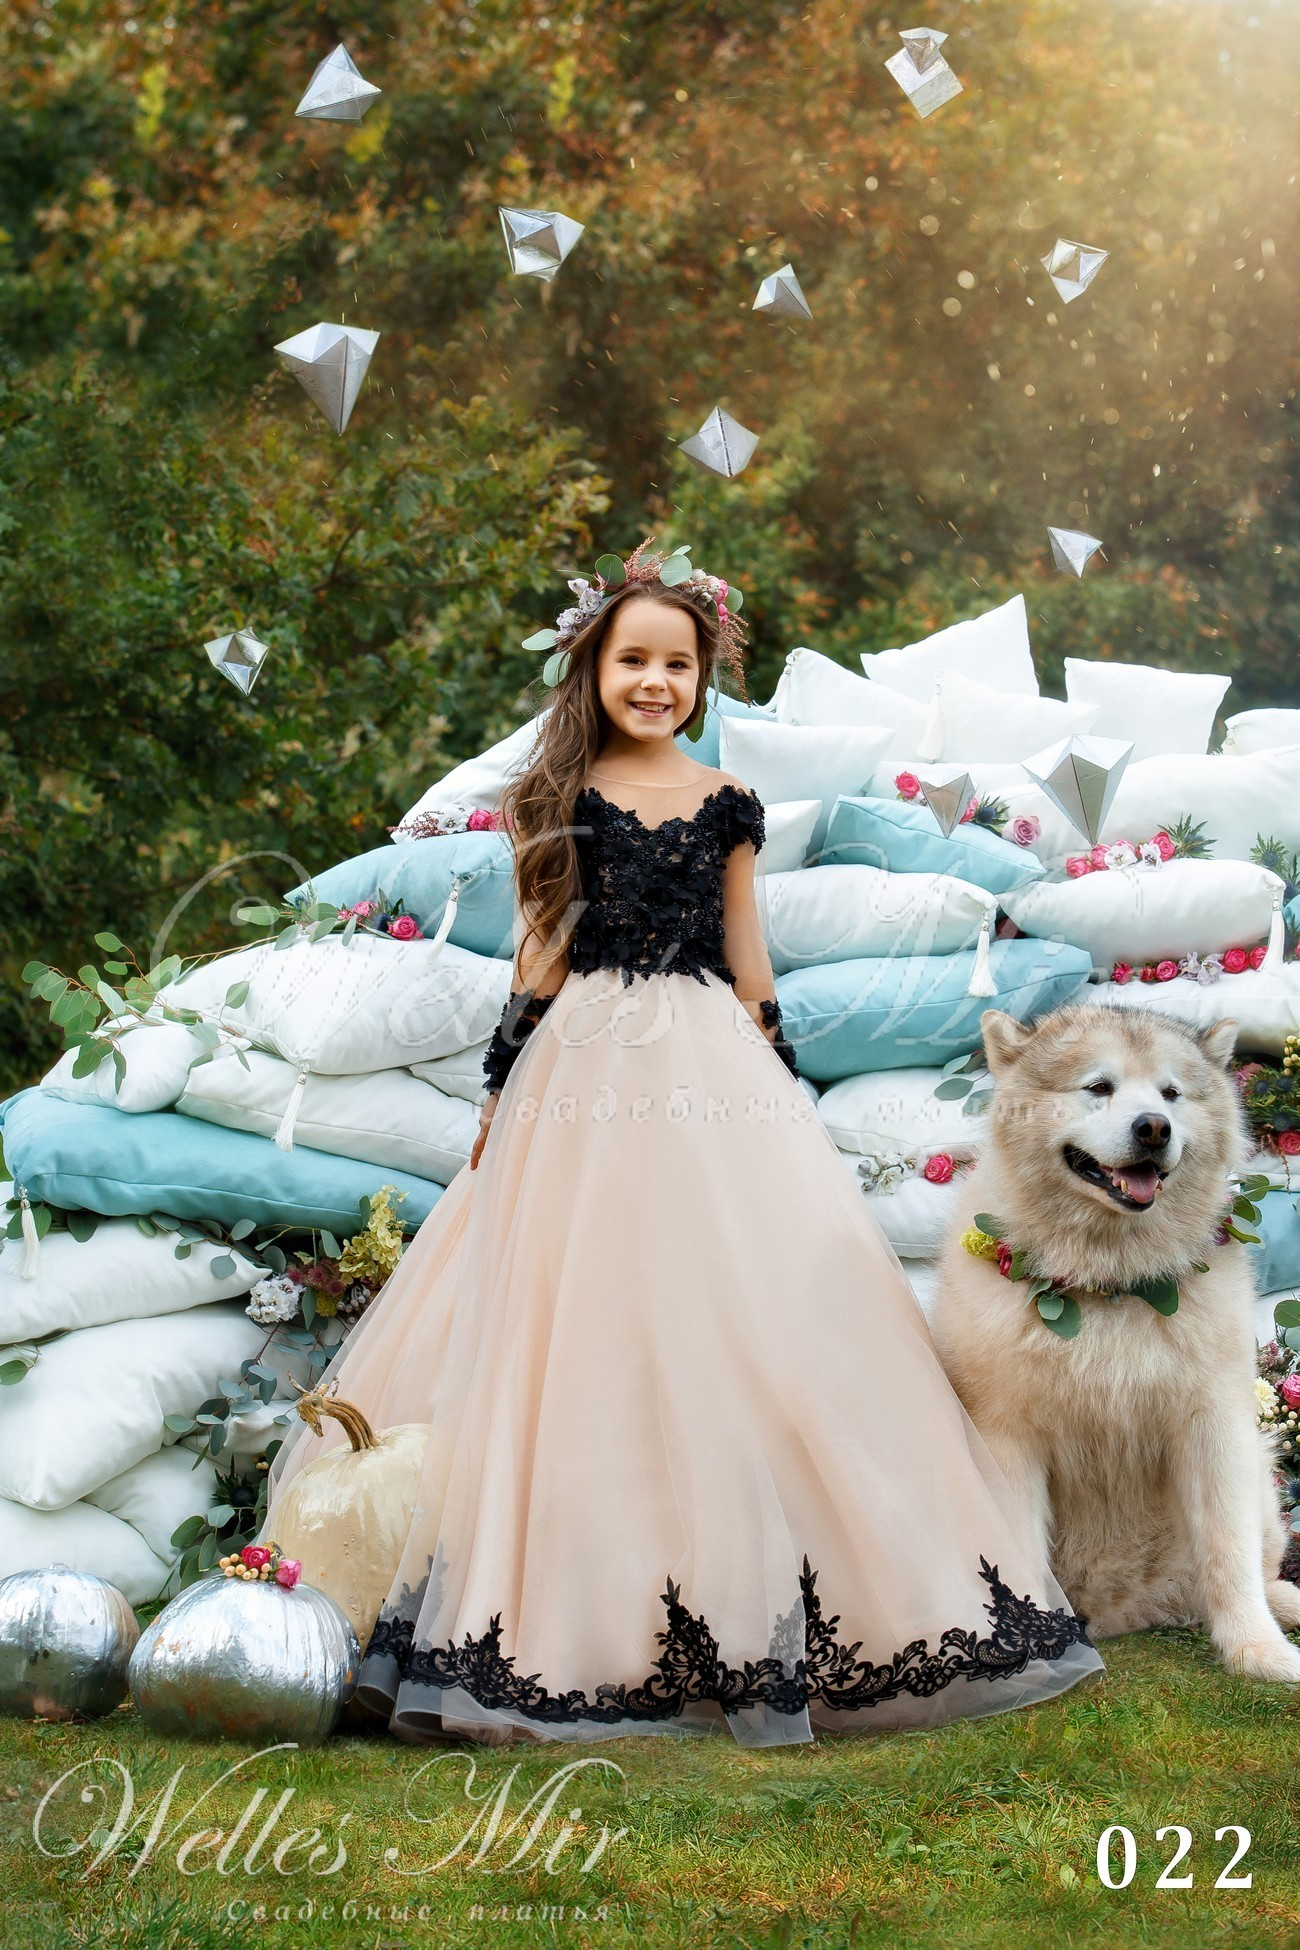 Детские платья Kids Deluxe Collection 2018 - 022